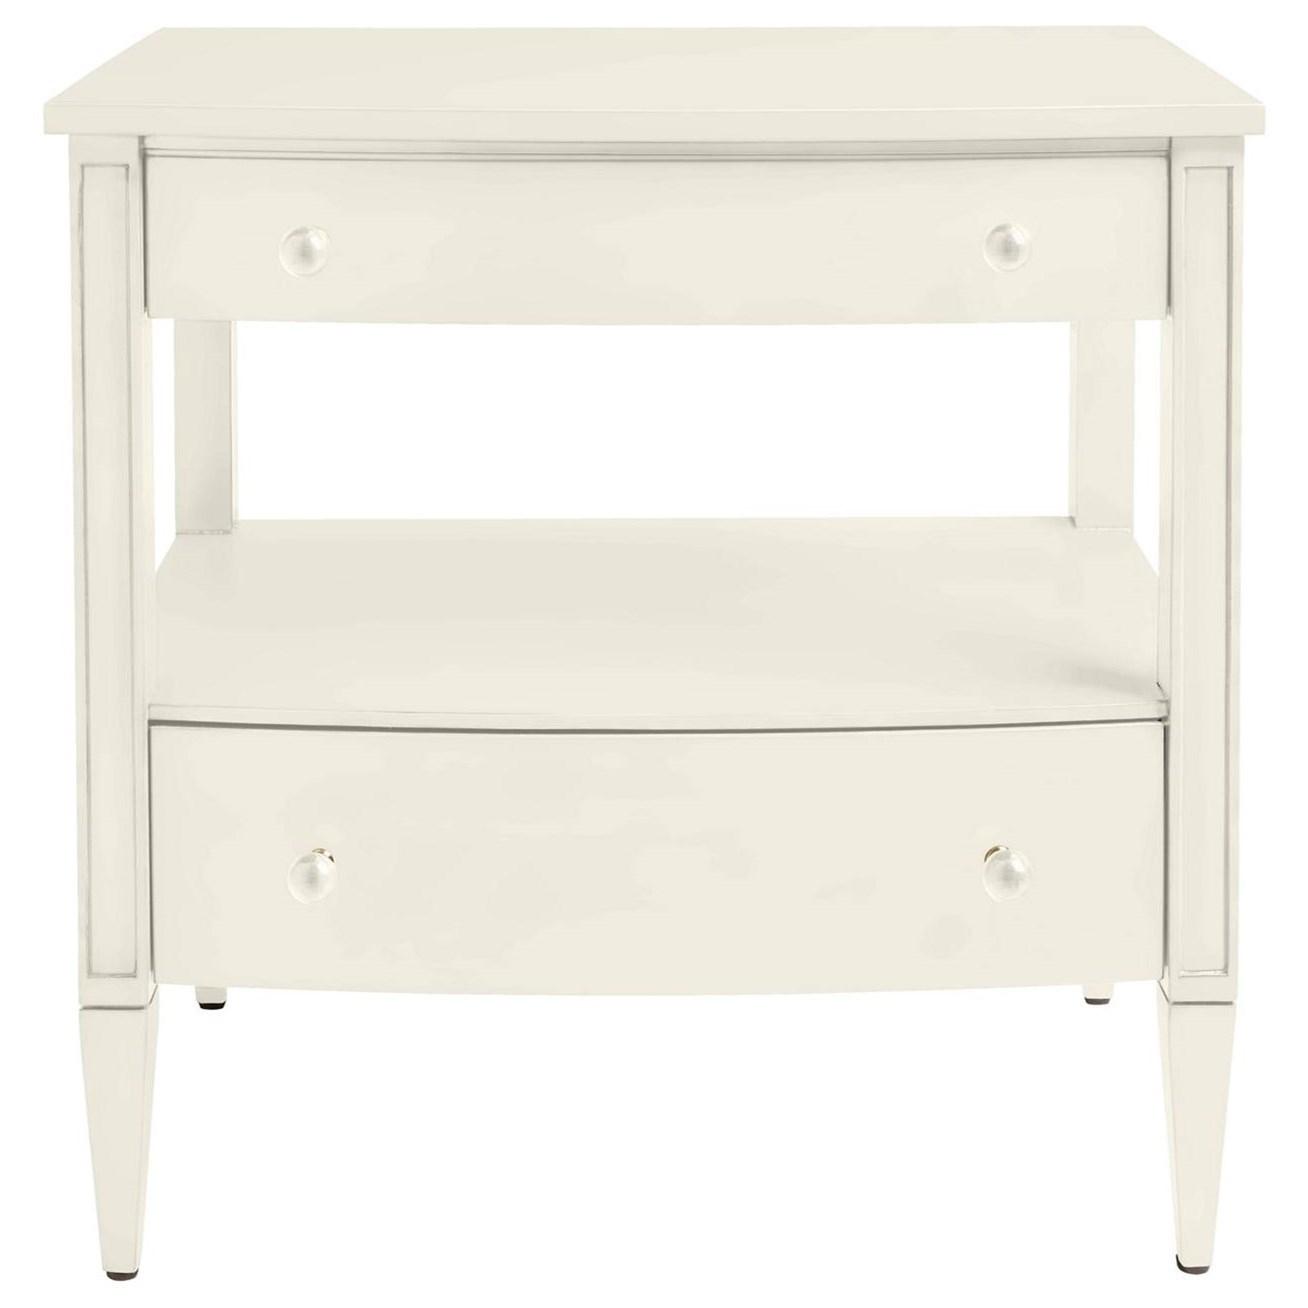 Stanley Furniture Coastal Living Oasis Mulholland Nightstand - Item Number: 527-23-80